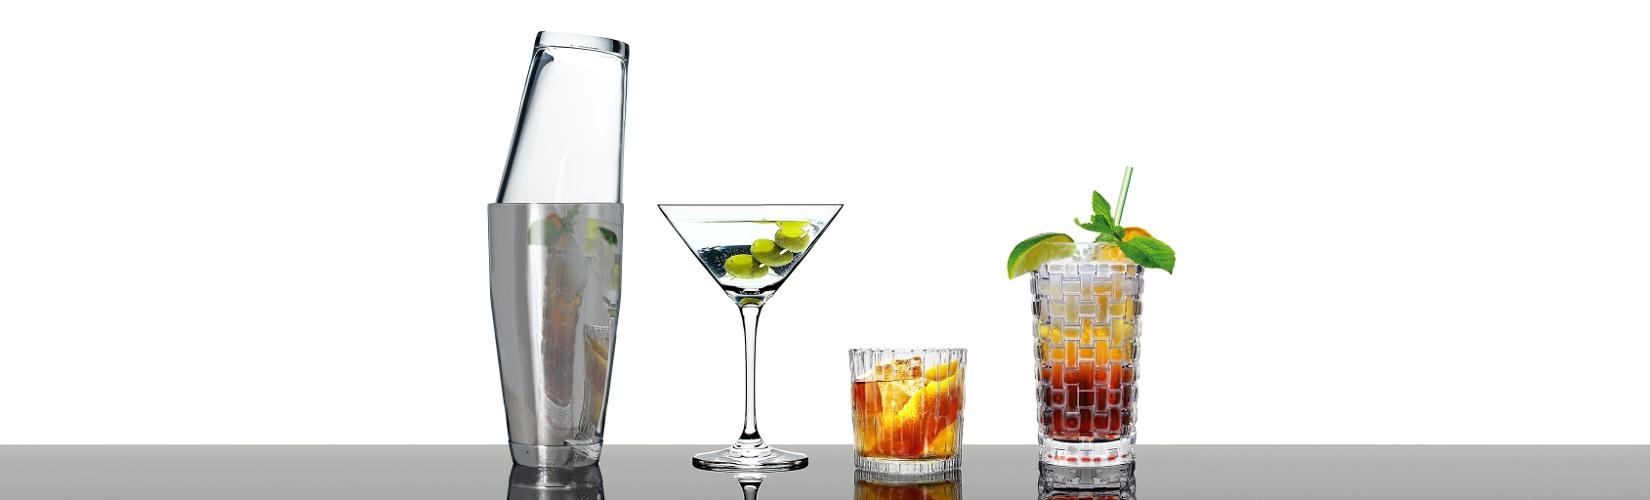 Barklassiker Cocktail Sucht Glas Glasklar Berlin